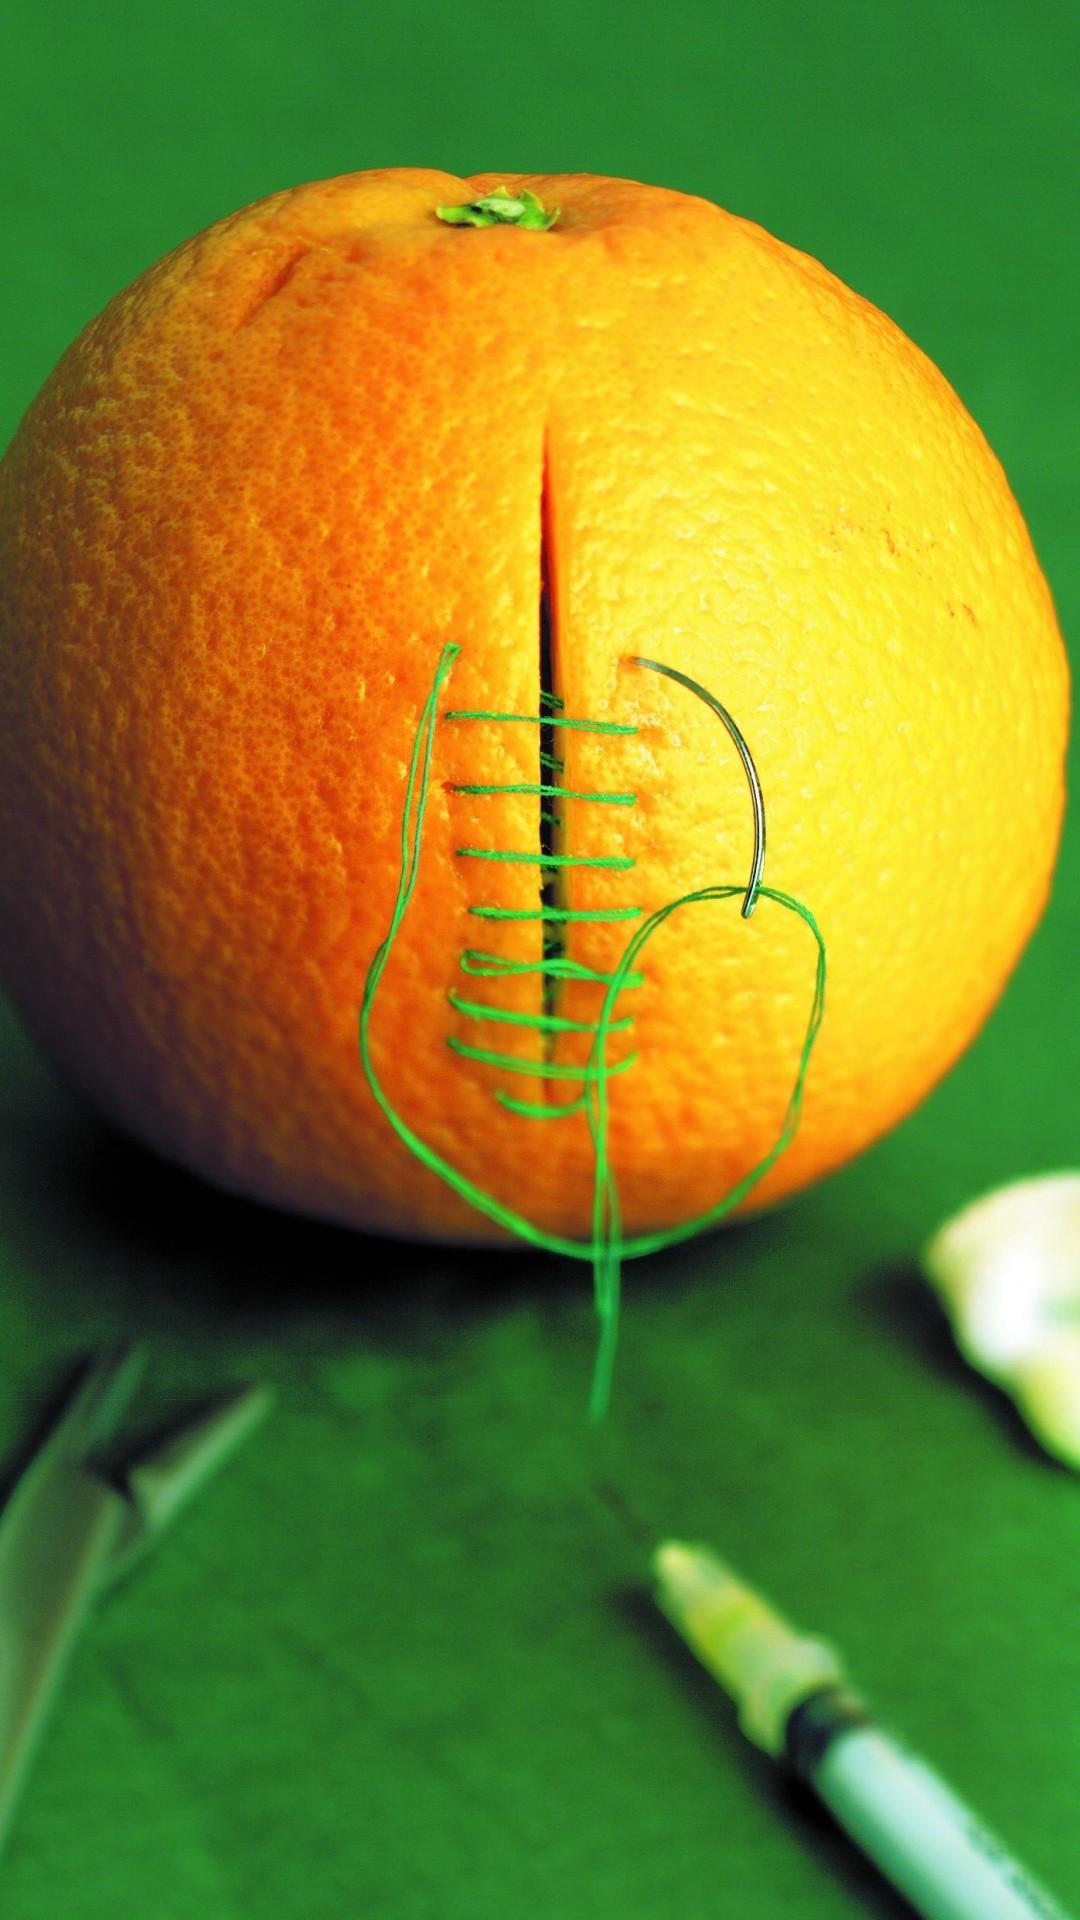 Wallpaper orange, cutting, sewing, stitching, green background